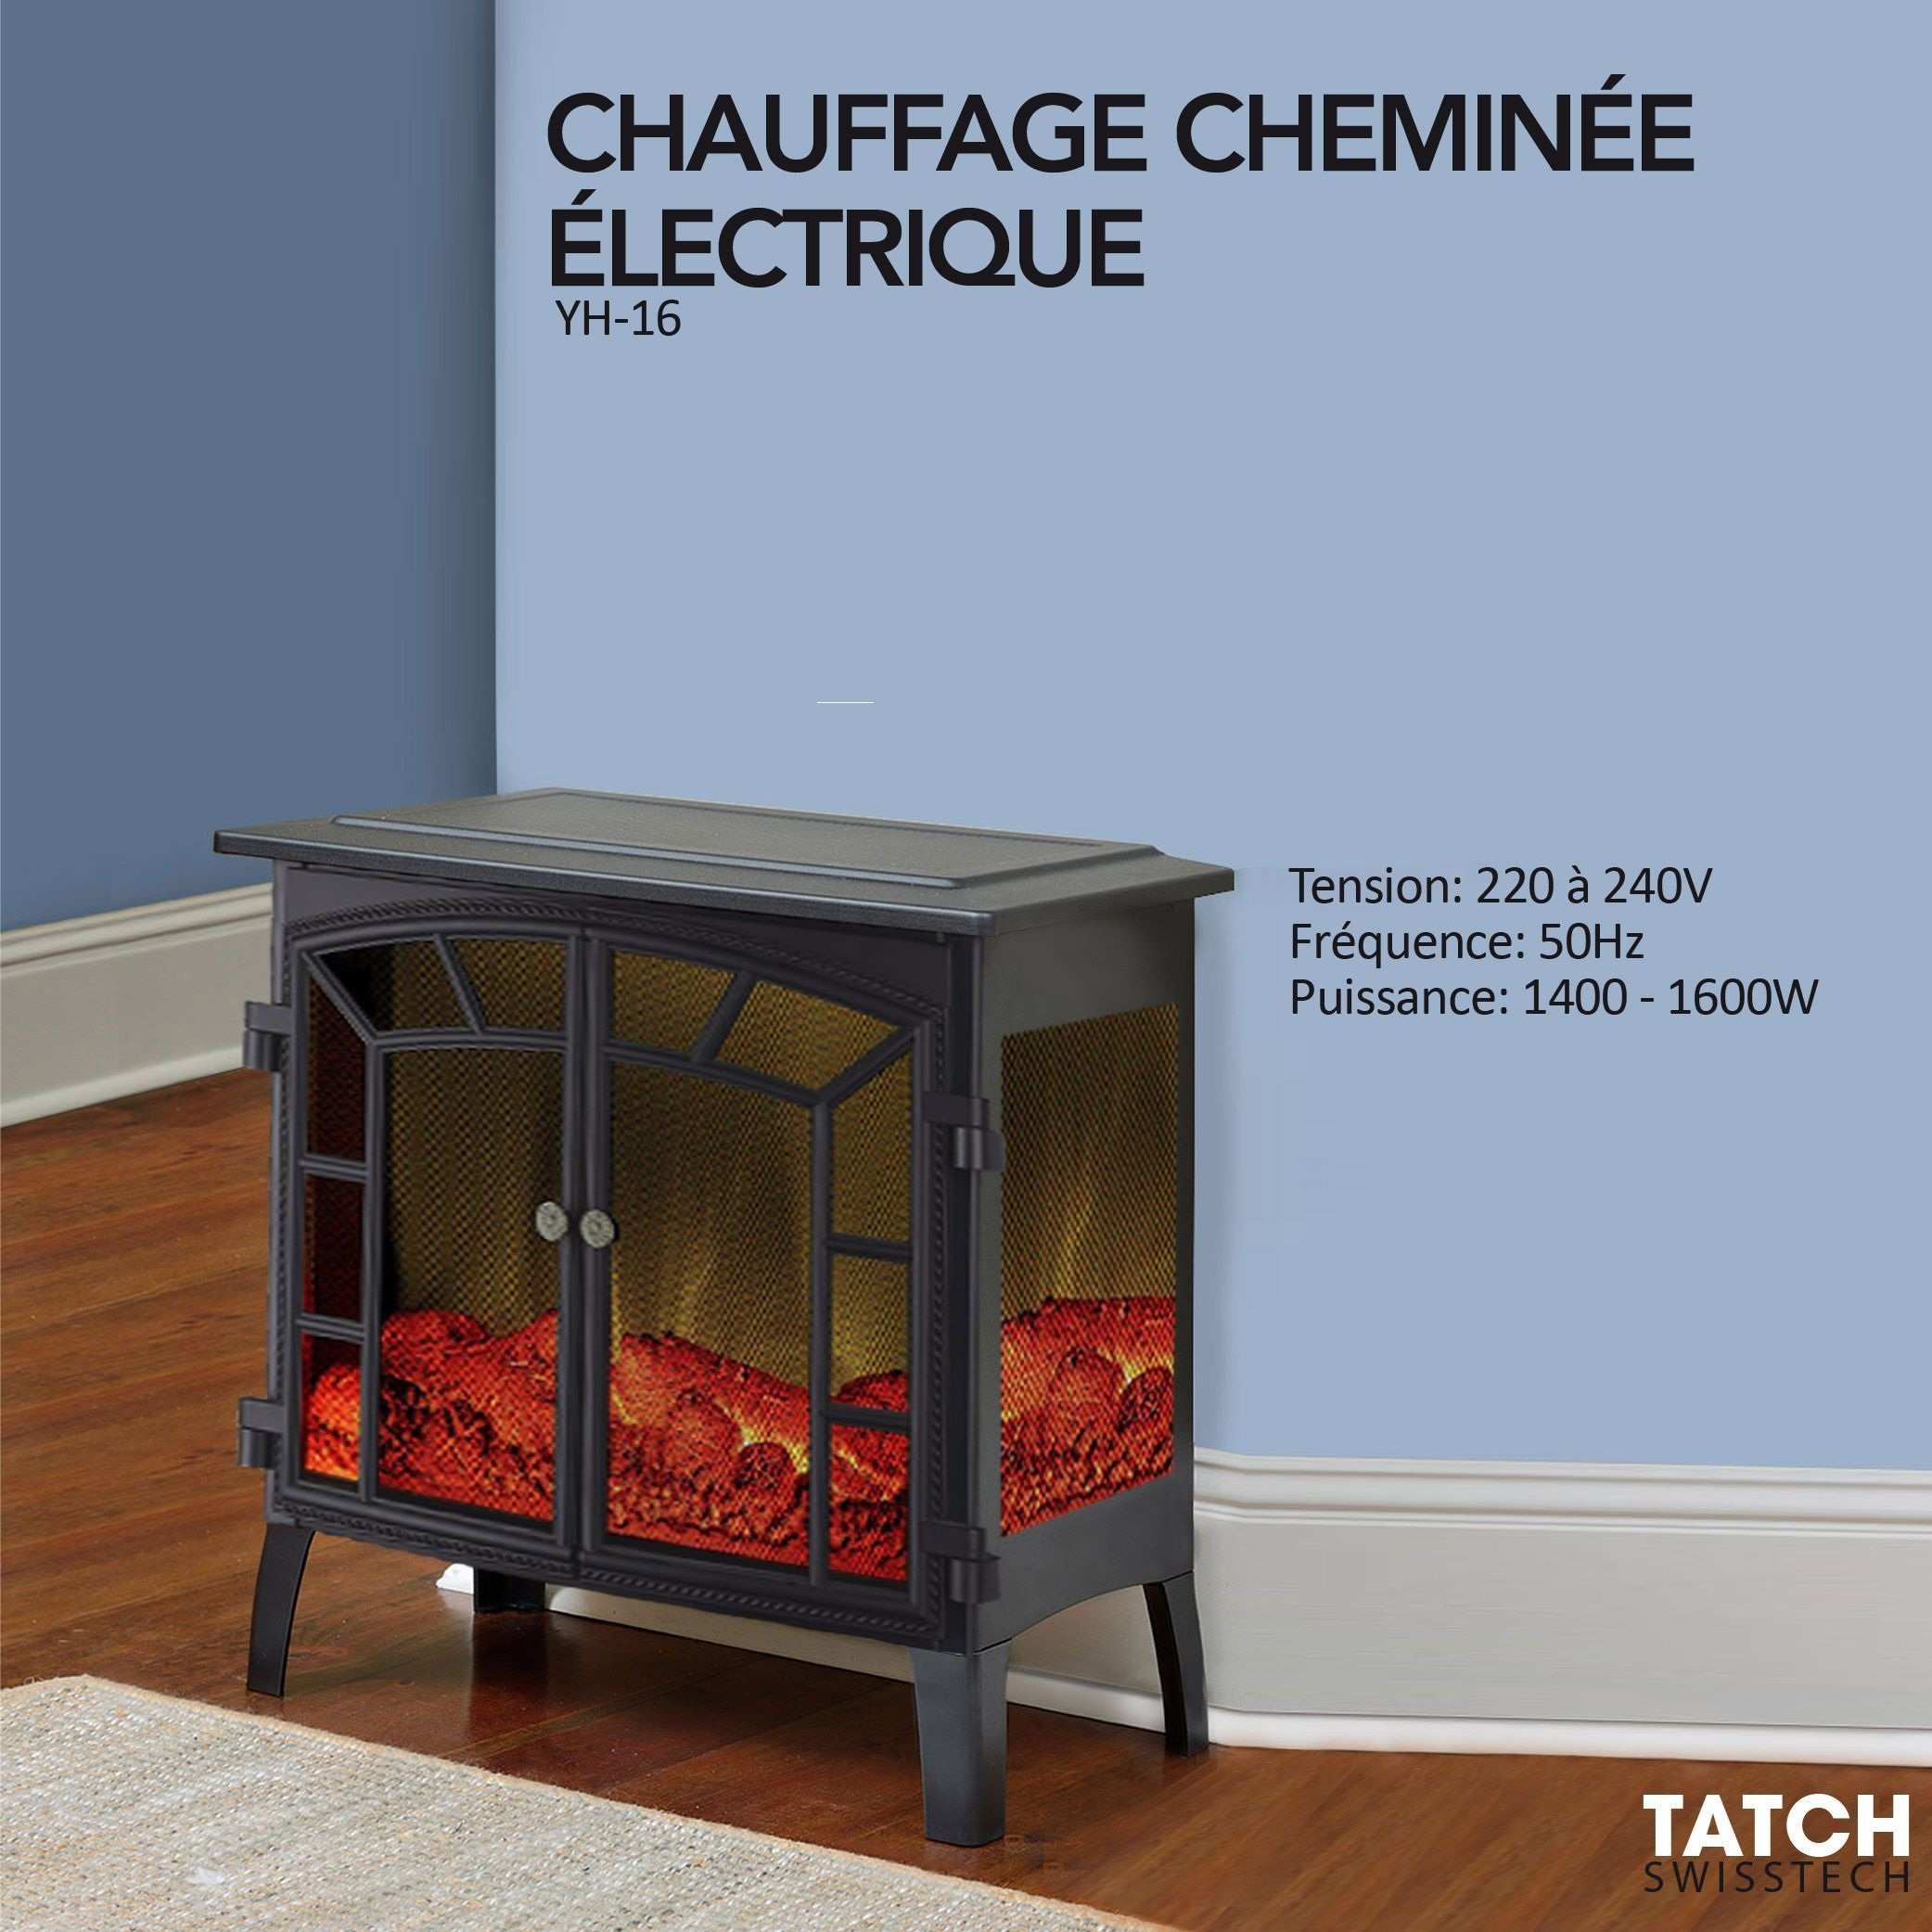 Chauffage Cheminee éléctrique - Tatch SwissTech REF:YH-16